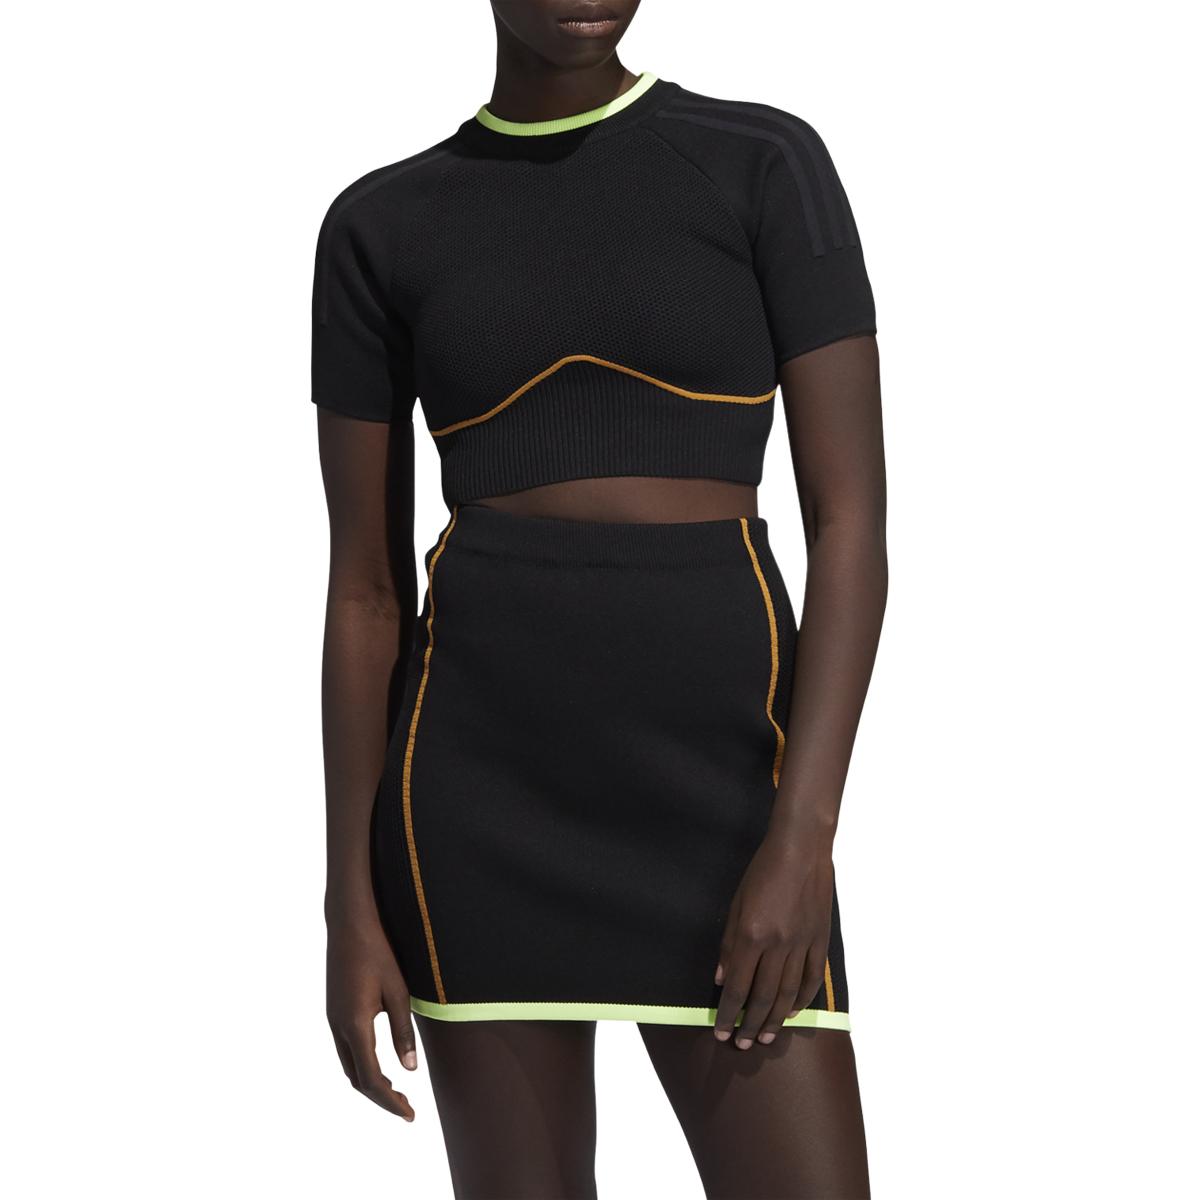 adidas IVY PARK Knit Crop Top